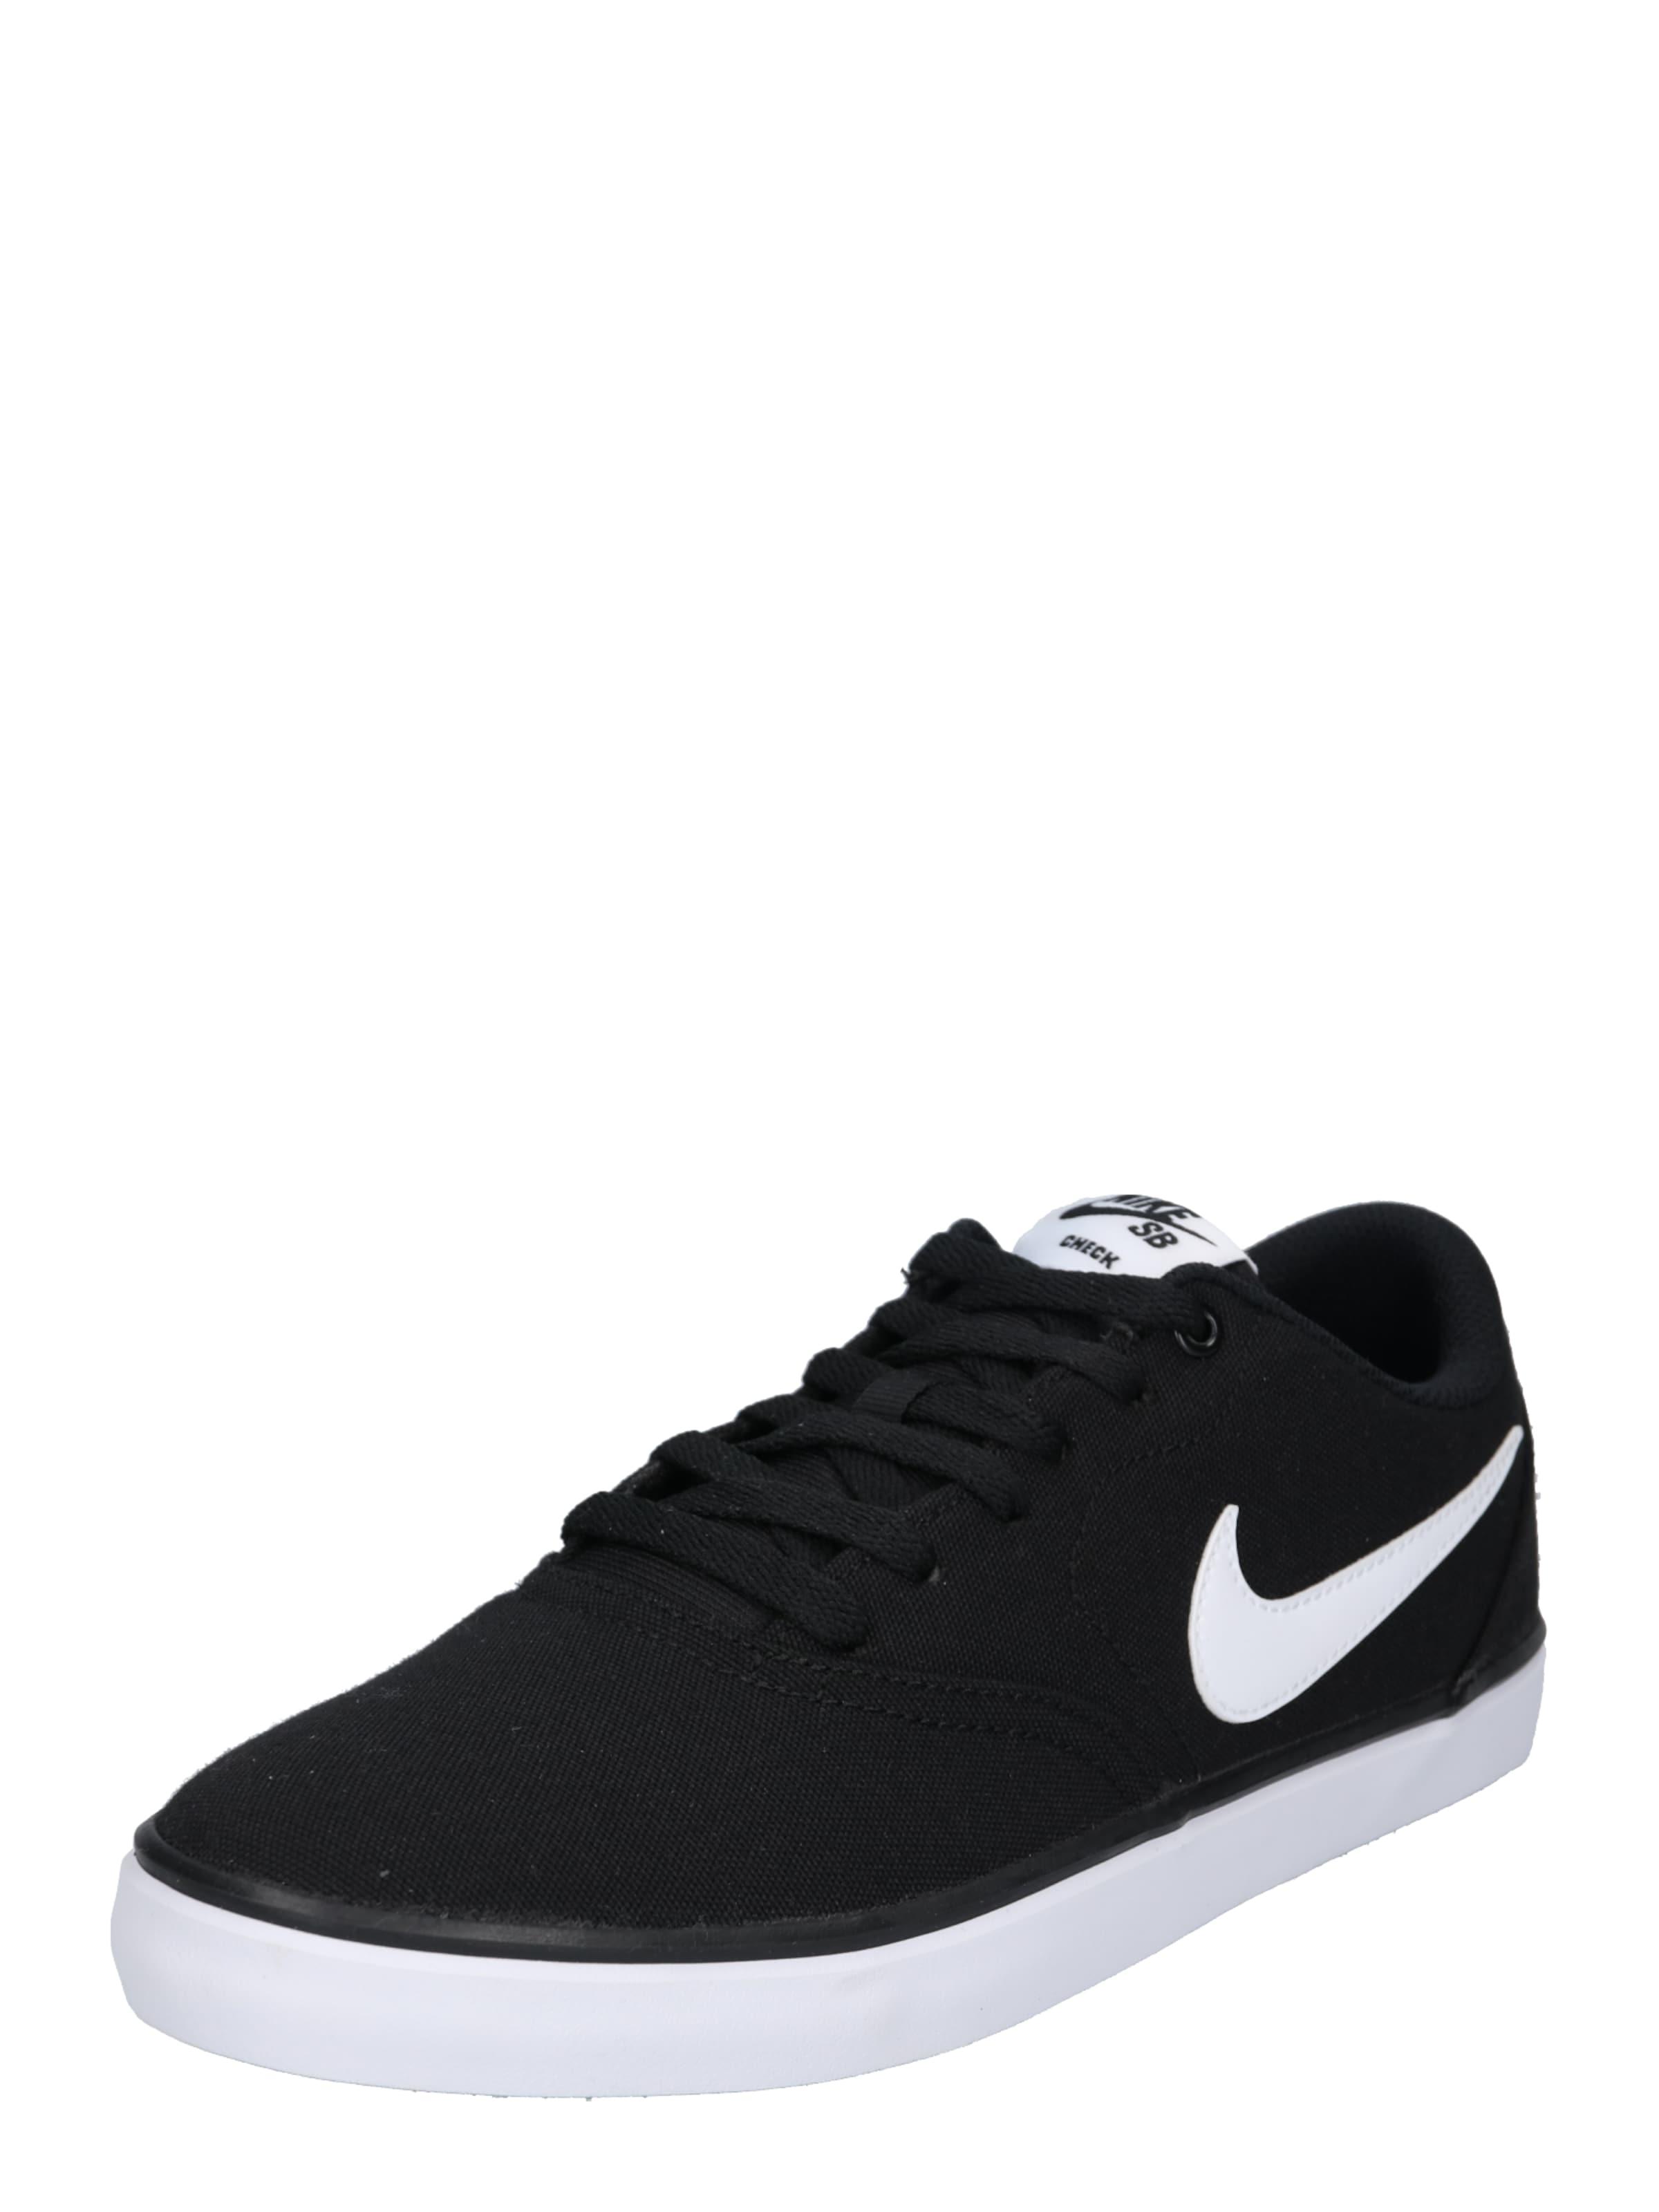 Schwarz Solar' Nike In Sneaker Sb 'check 7vygImYbf6